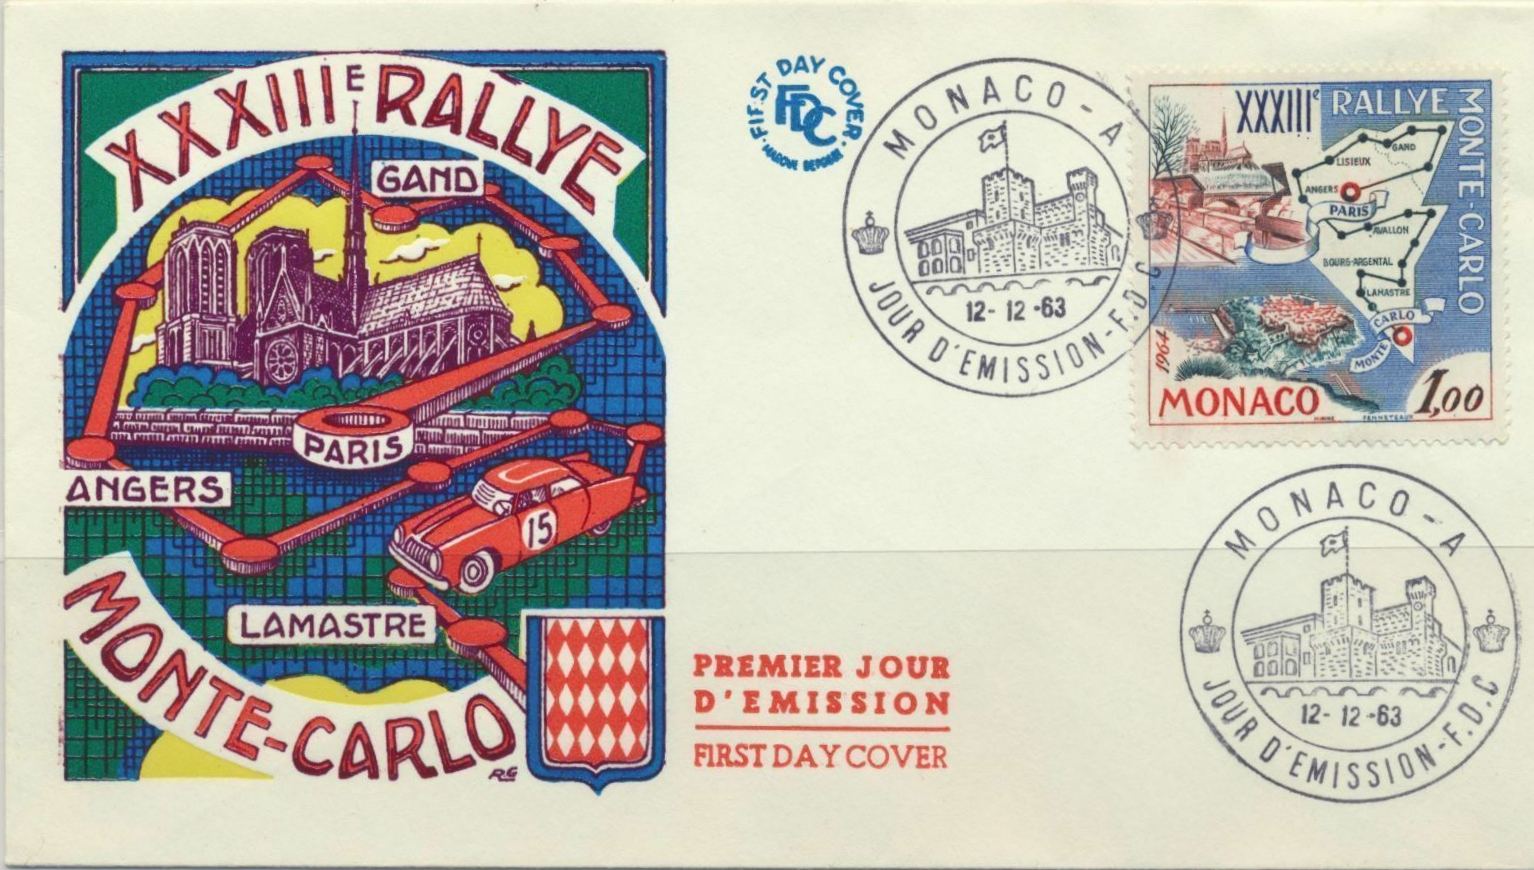 Monaco - Scott #549 (1963) first day cover